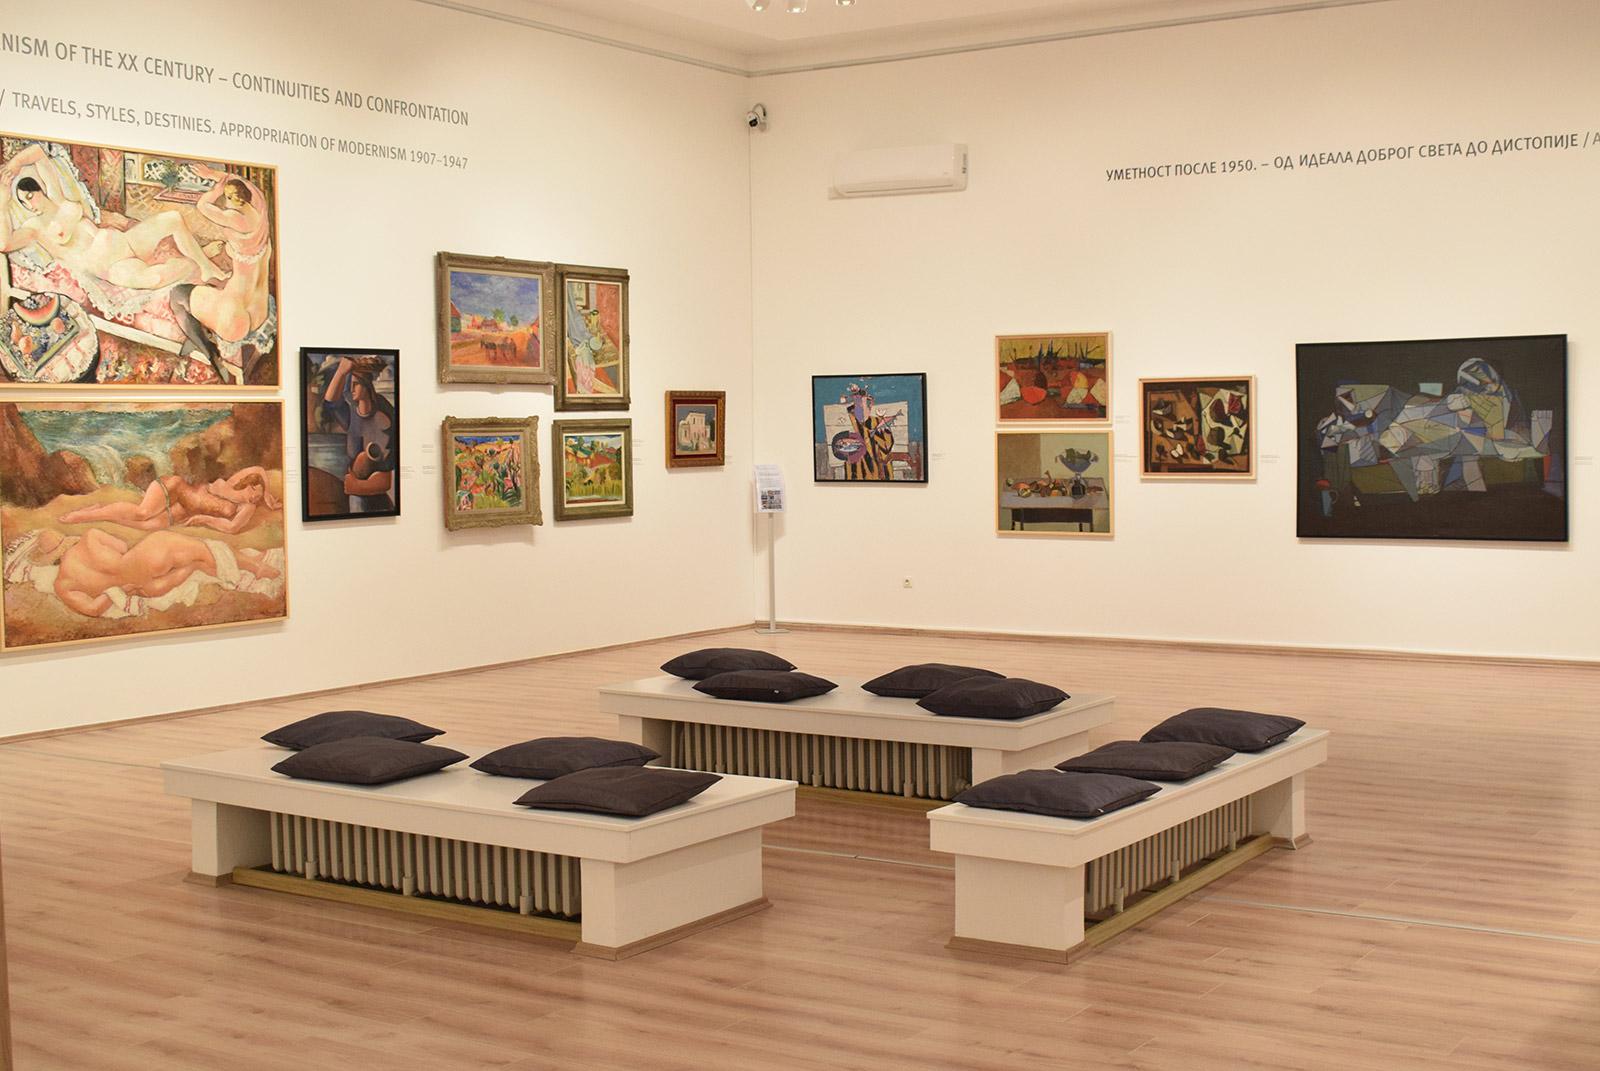 Umetnost XX veka u Galeriji Matice srpske